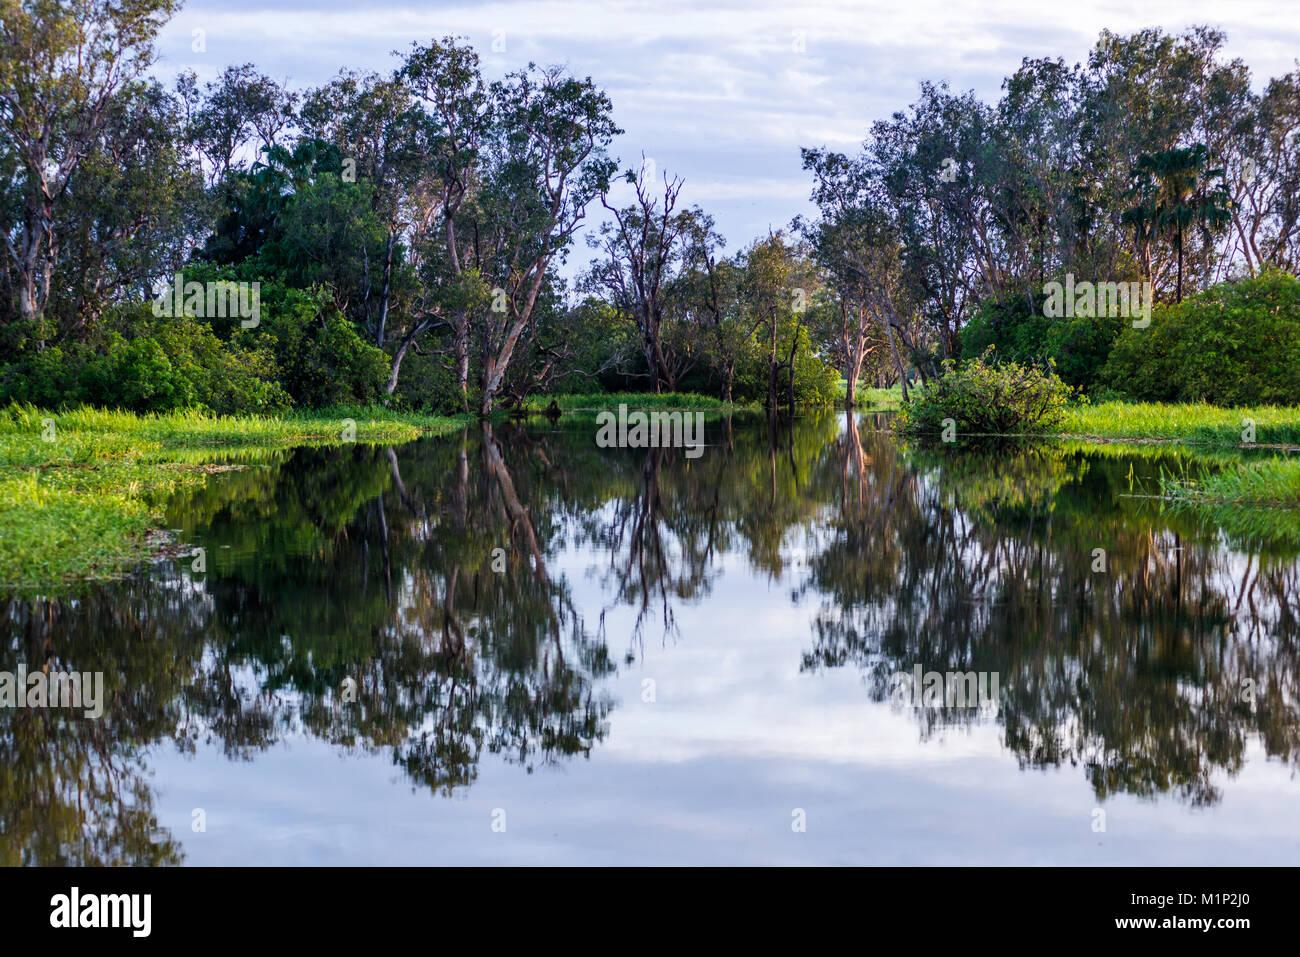 Yellow Water billabong and wetland, Kakadu National Park, UNESCO World Heritage Site, Northern Territory, Australia, Stock Photo